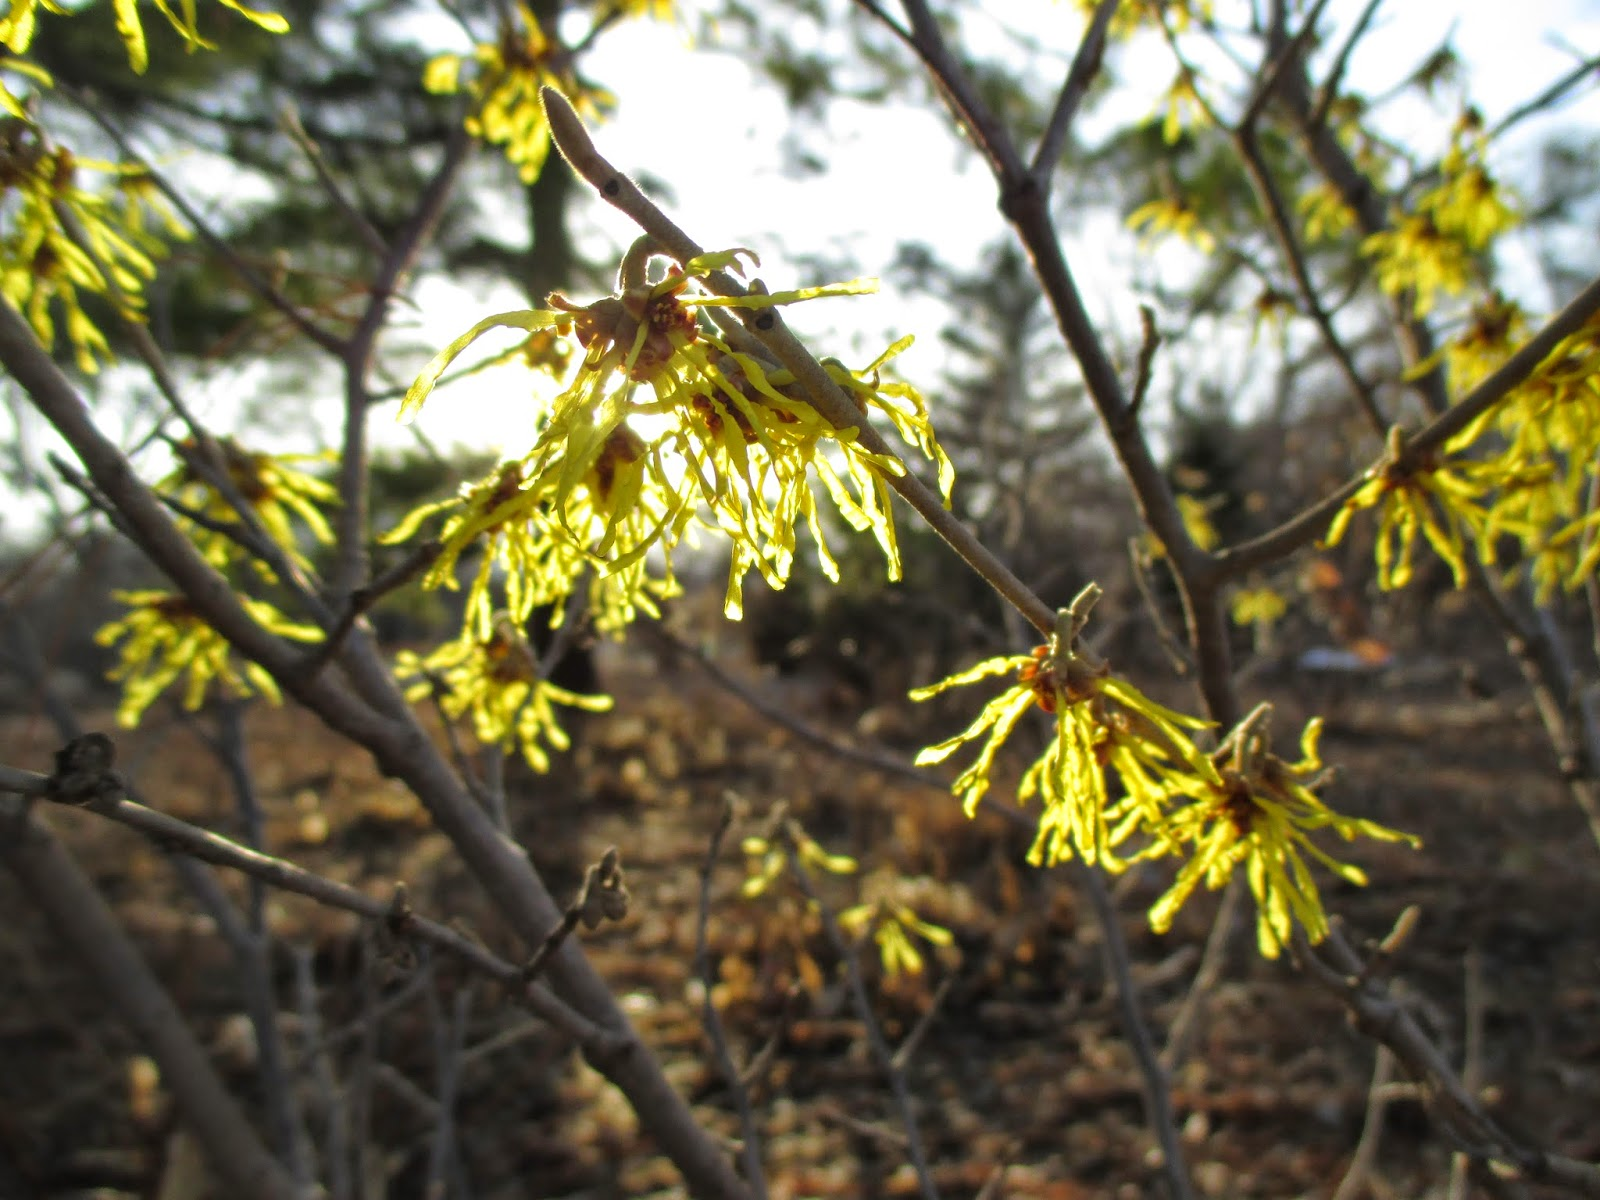 Olbrich Awakens Too - Rotary Botanical Gardens